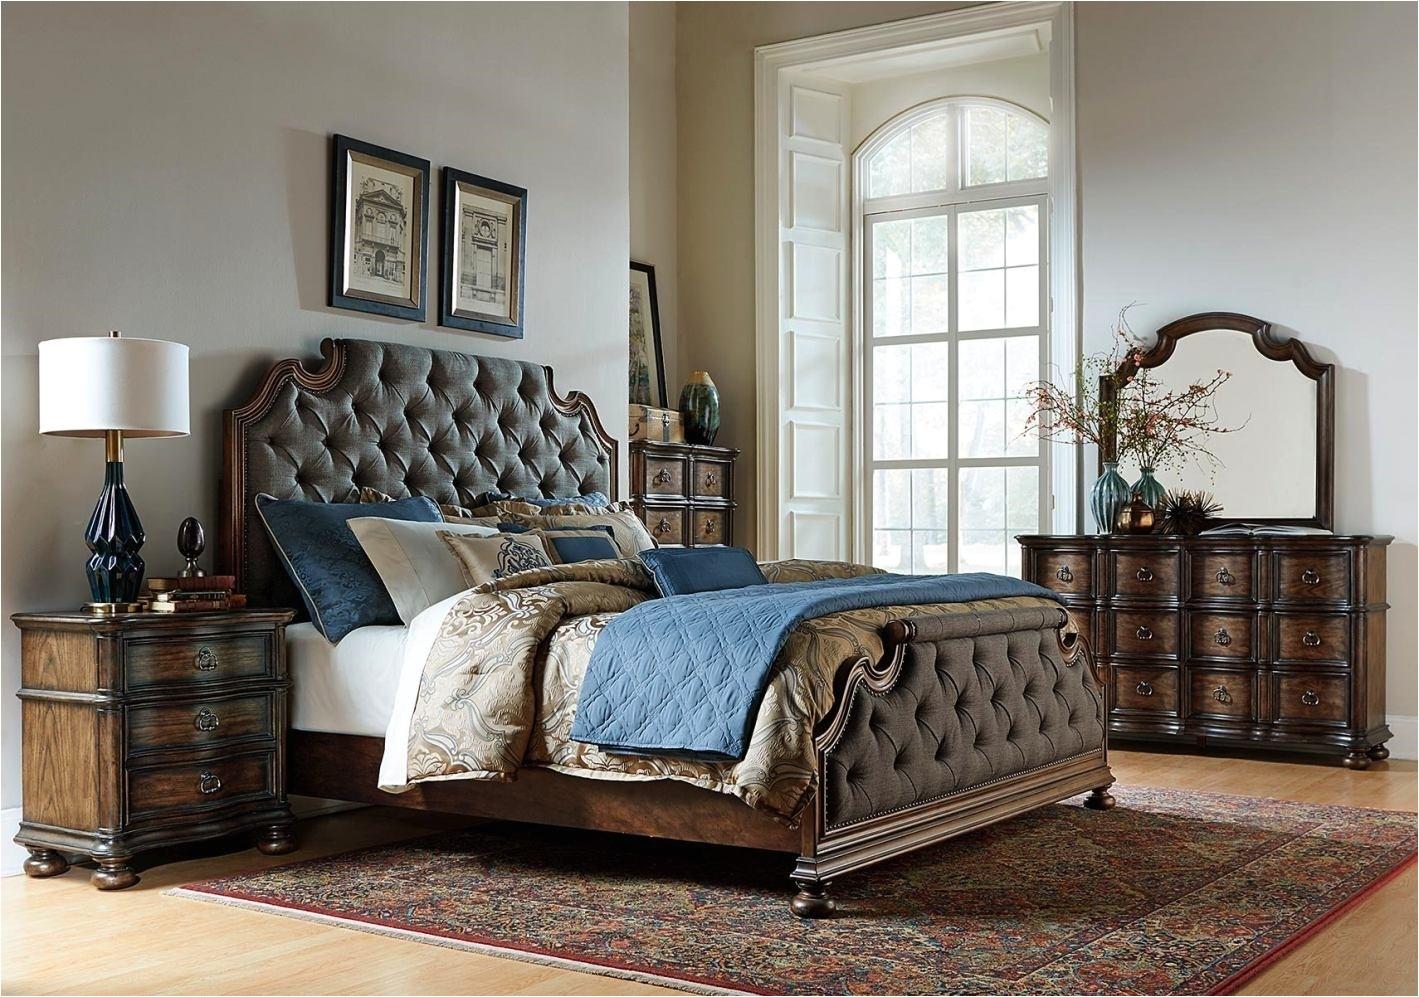 lfd furniture mcallen 7 lacks definition 3step bedroom makeover lfd regarding lfd furniture mcallen tx